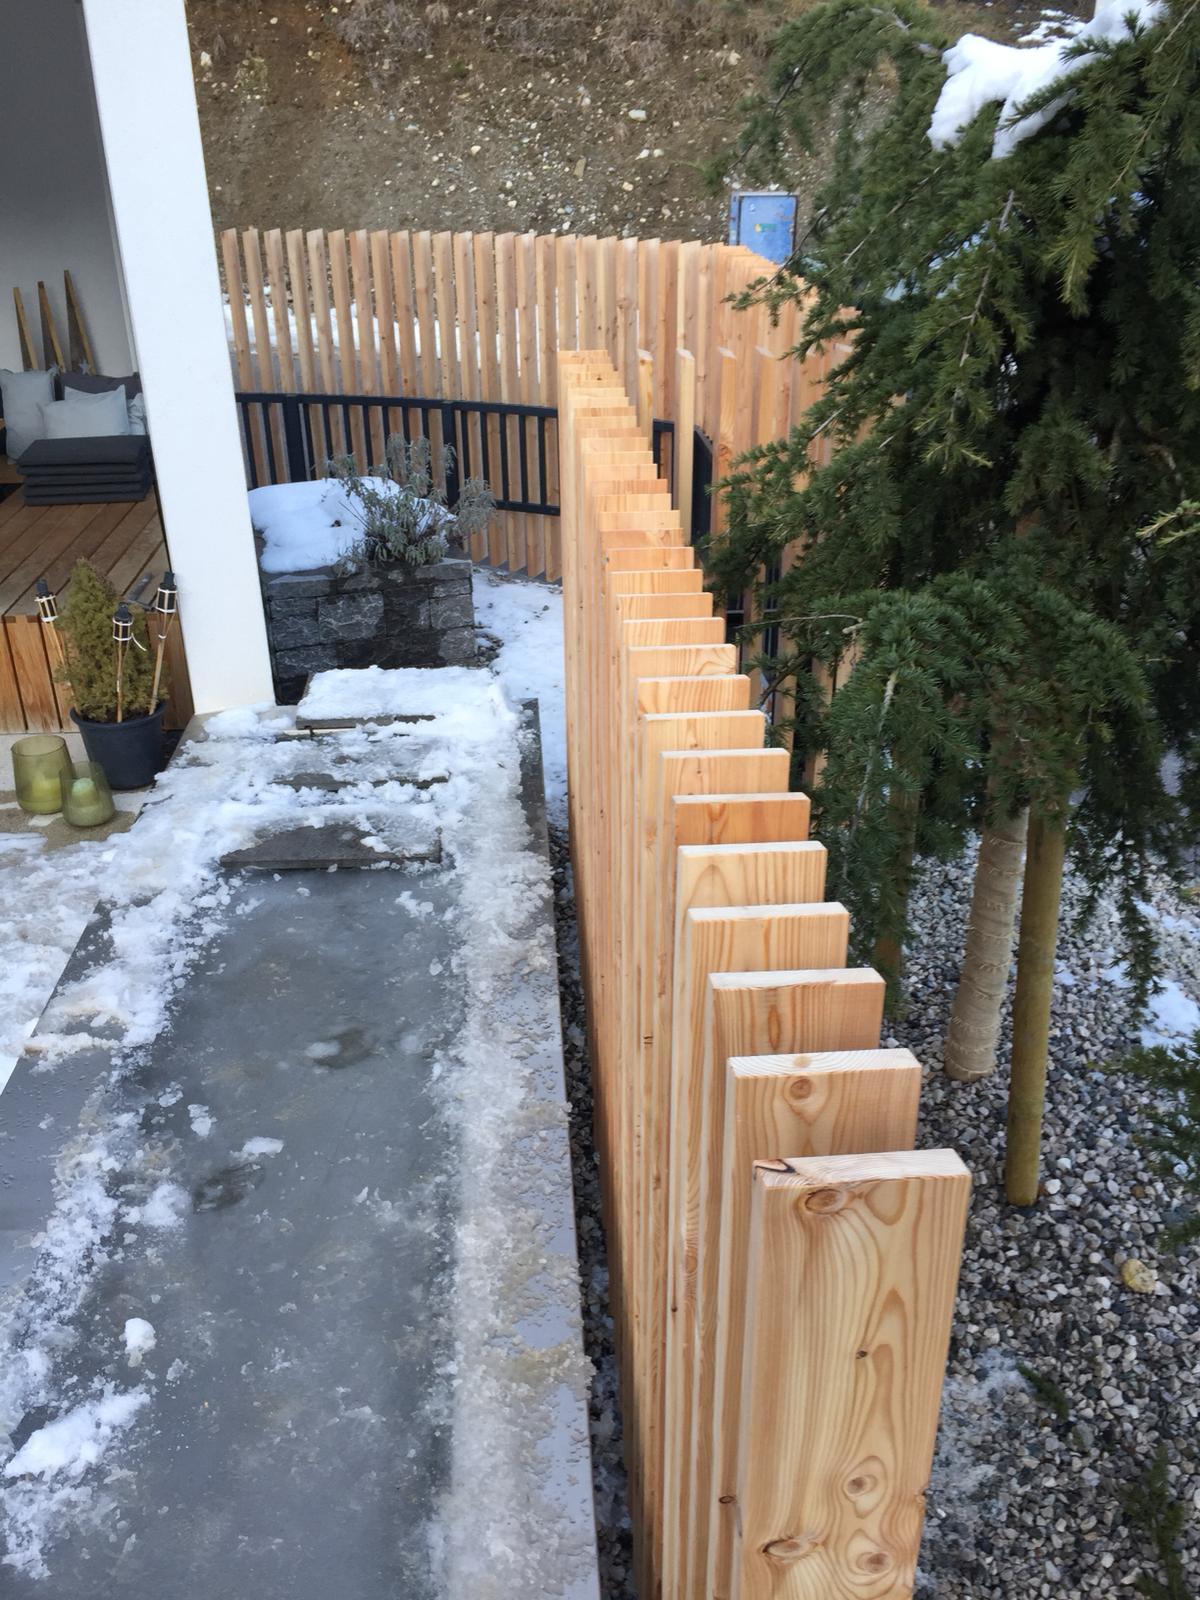 15-Holz-Zaun-2018-Norz-Thaur.JPG